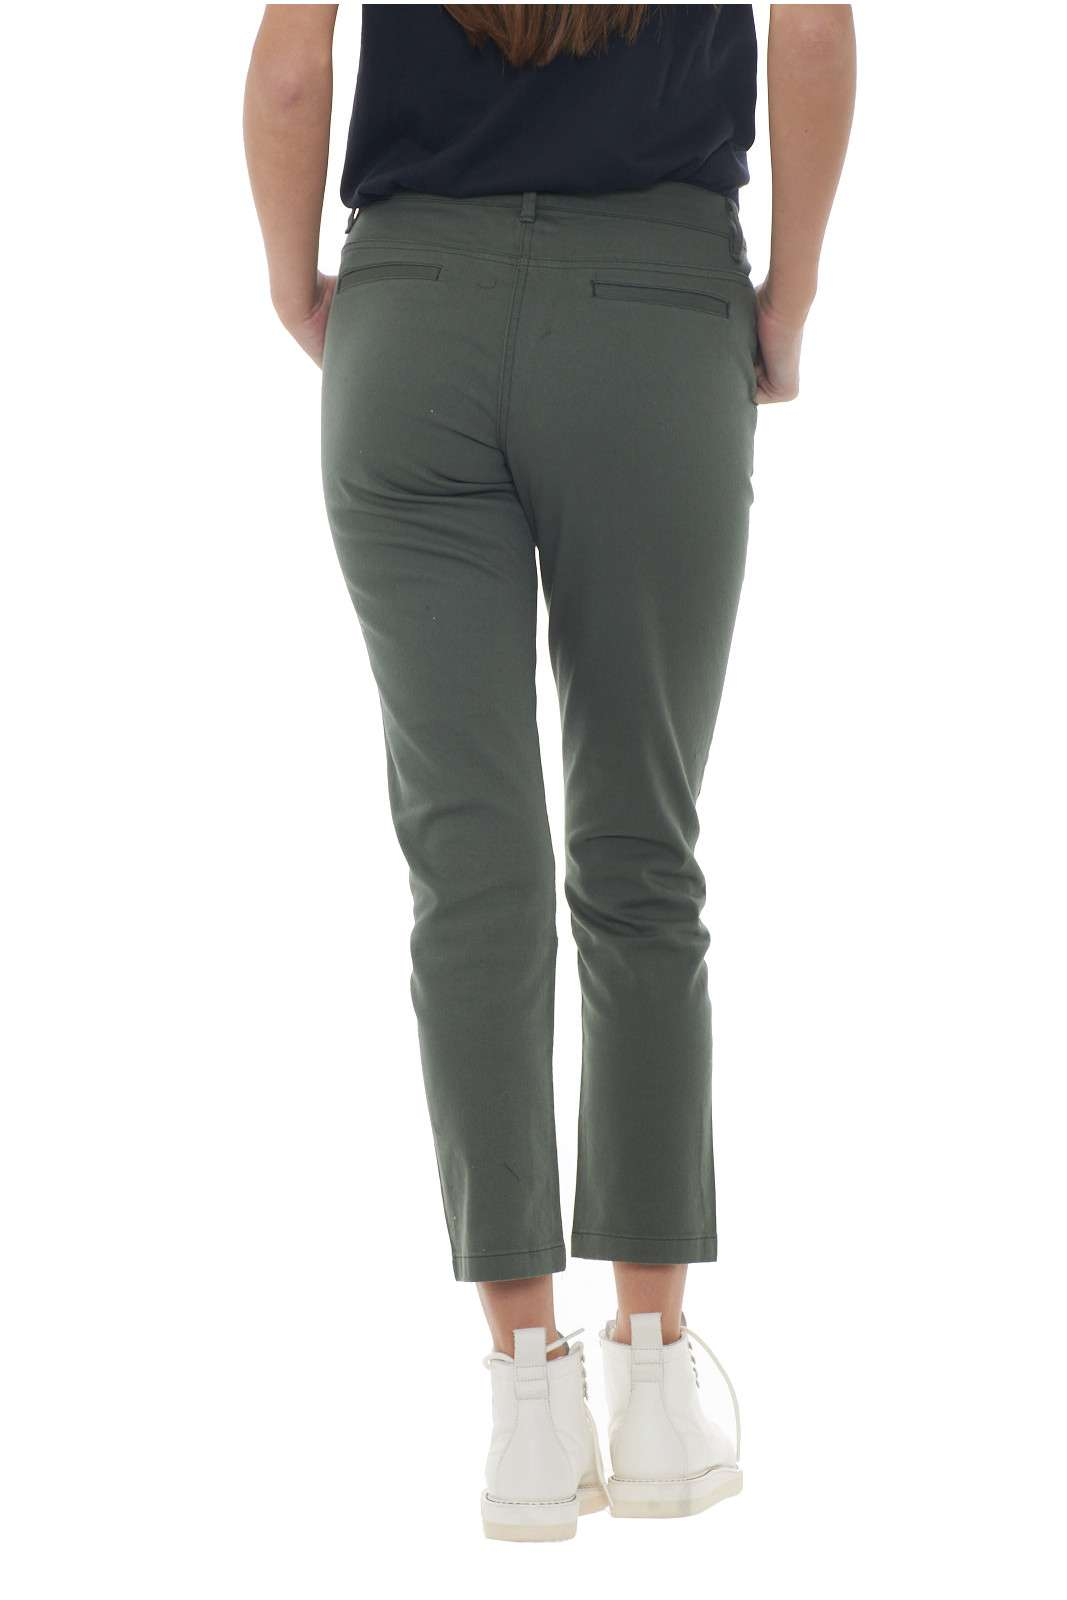 https://www.parmax.com/media/catalog/product/a/i/AI-outlet_parmax-pantaloni-donna-SH-Collection-18102019-C.jpg